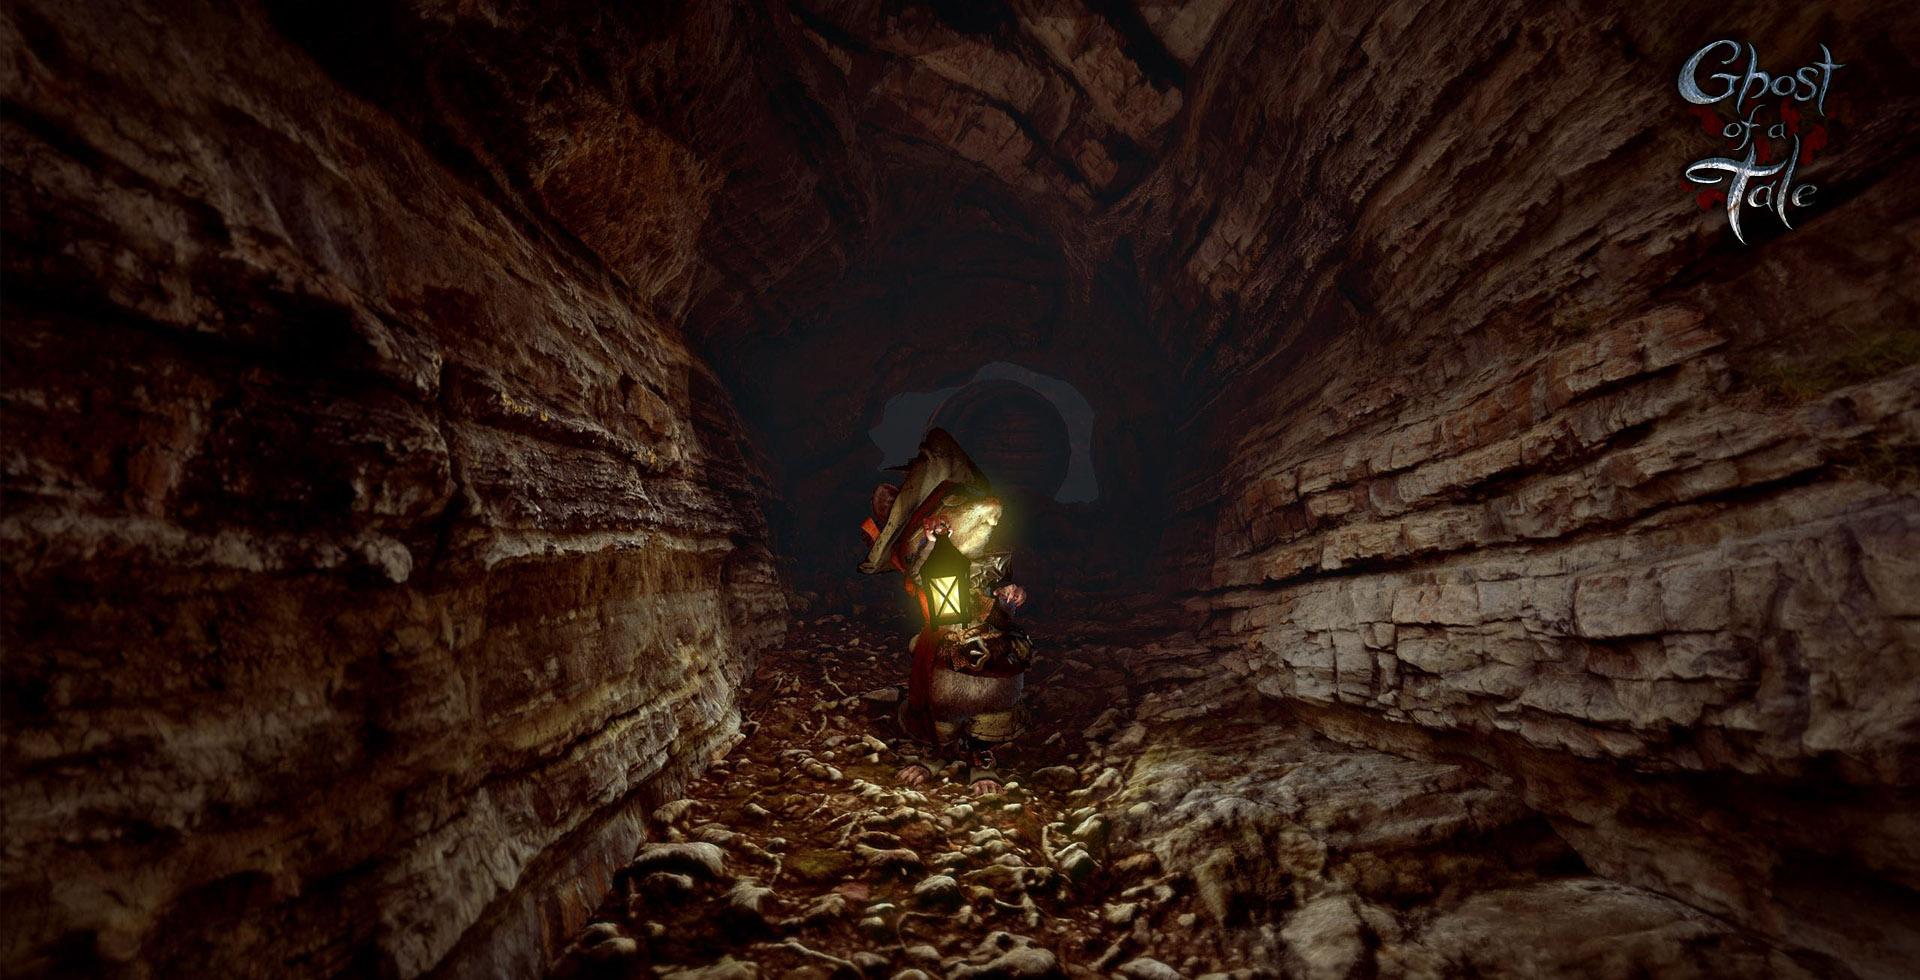 Ghost of a Tale [v 7.91] (2018/PC/Русский), RePack от xatab